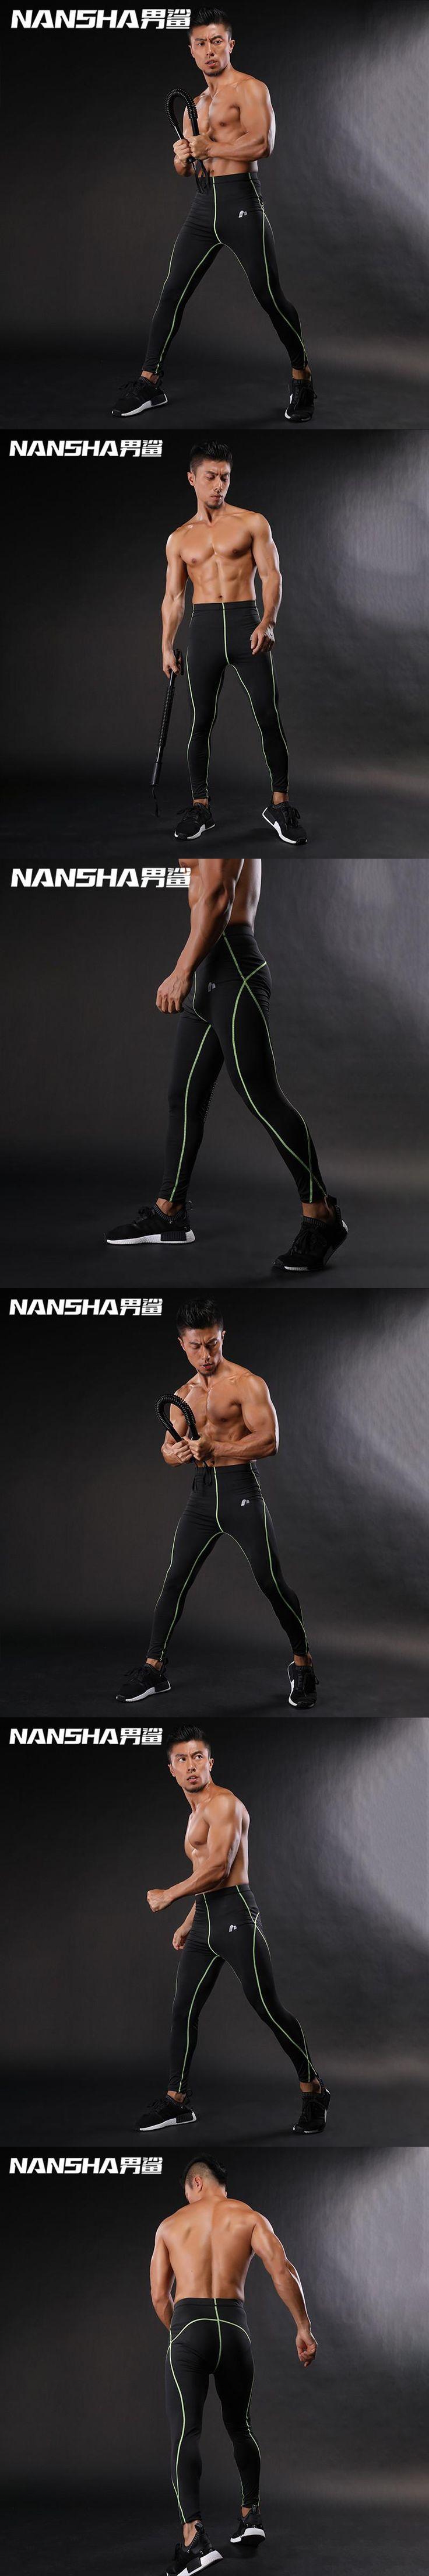 2017 New Fashion Men's Sexy Tight Pants Slim Fitted Active Pants Crossfit Sweatpants Elastic Fitness Men's Workout Pants NANSHA